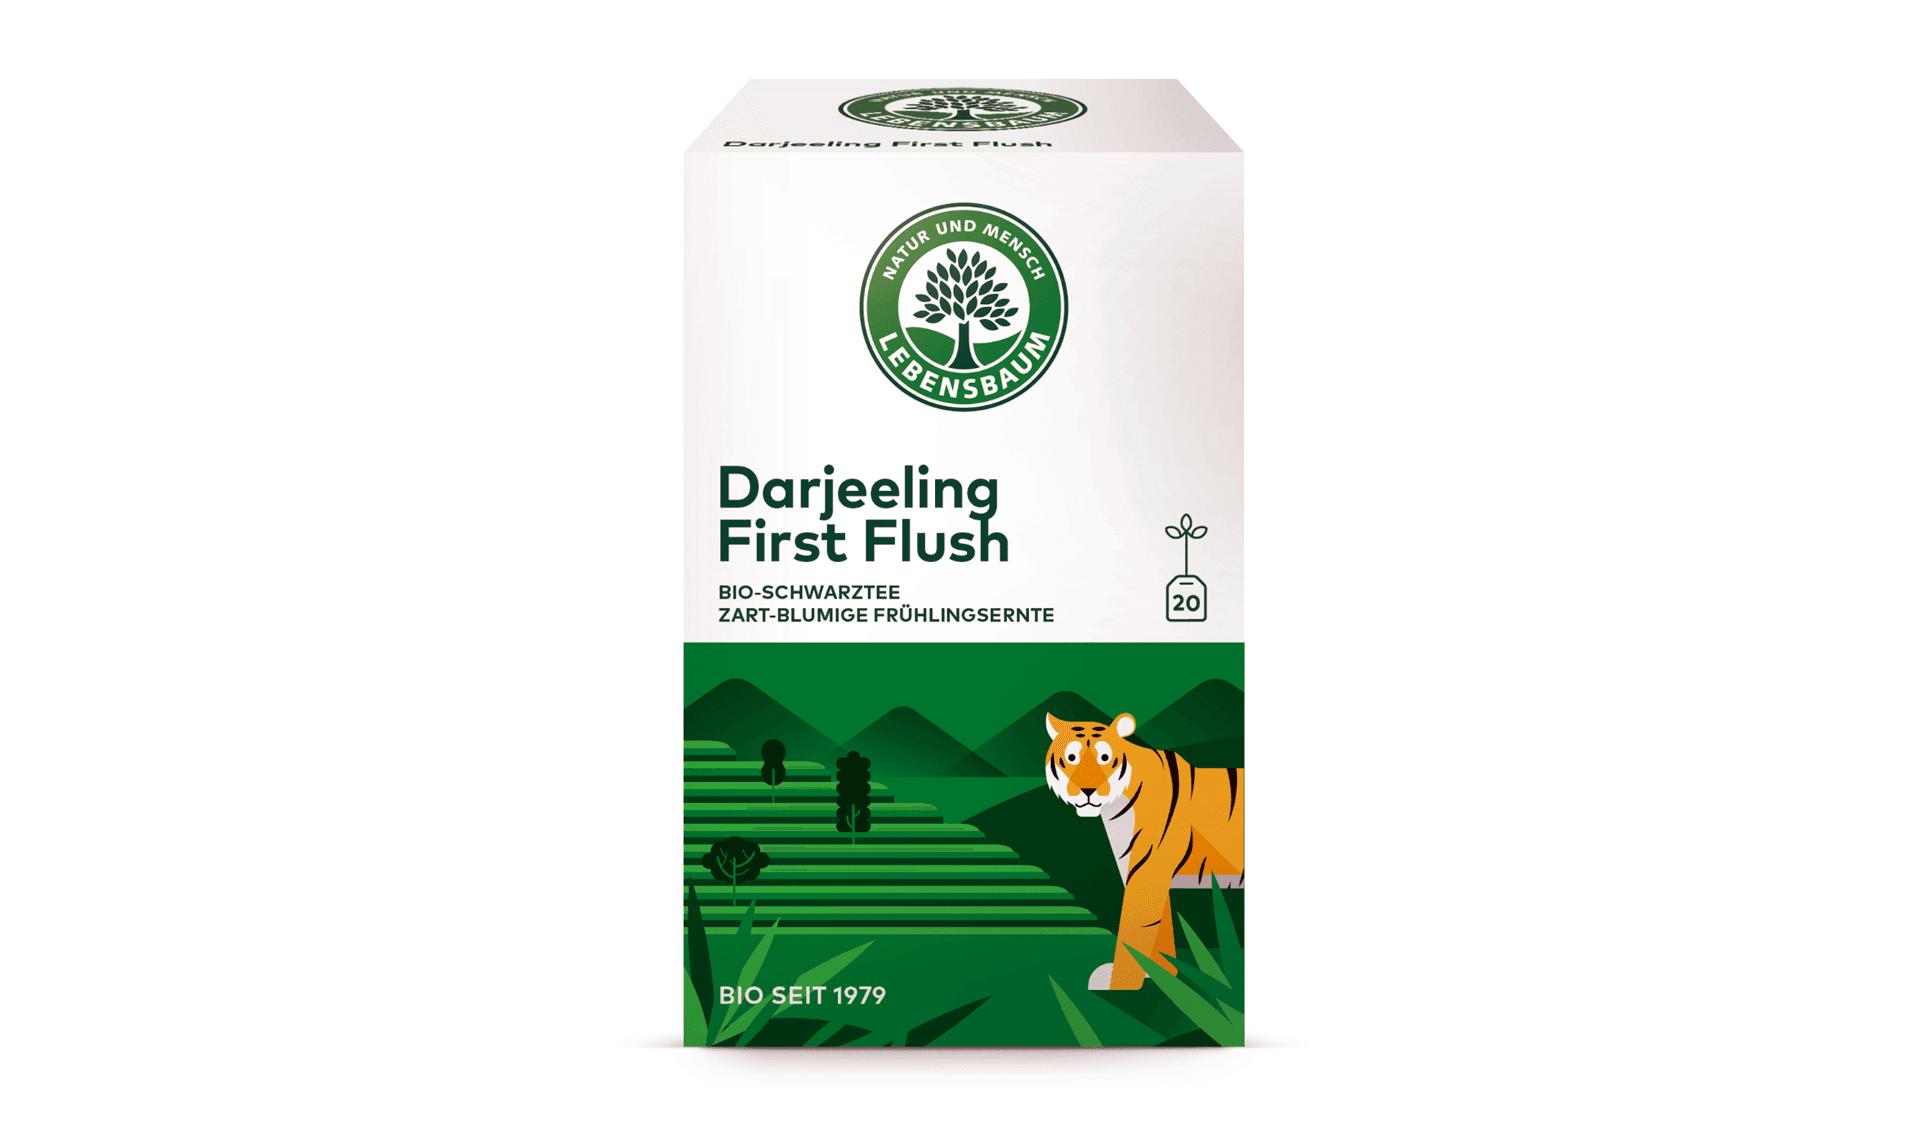 Lebensbaum Darjeeling First Flush, 20 Beutel (www.lebensbaum.com)